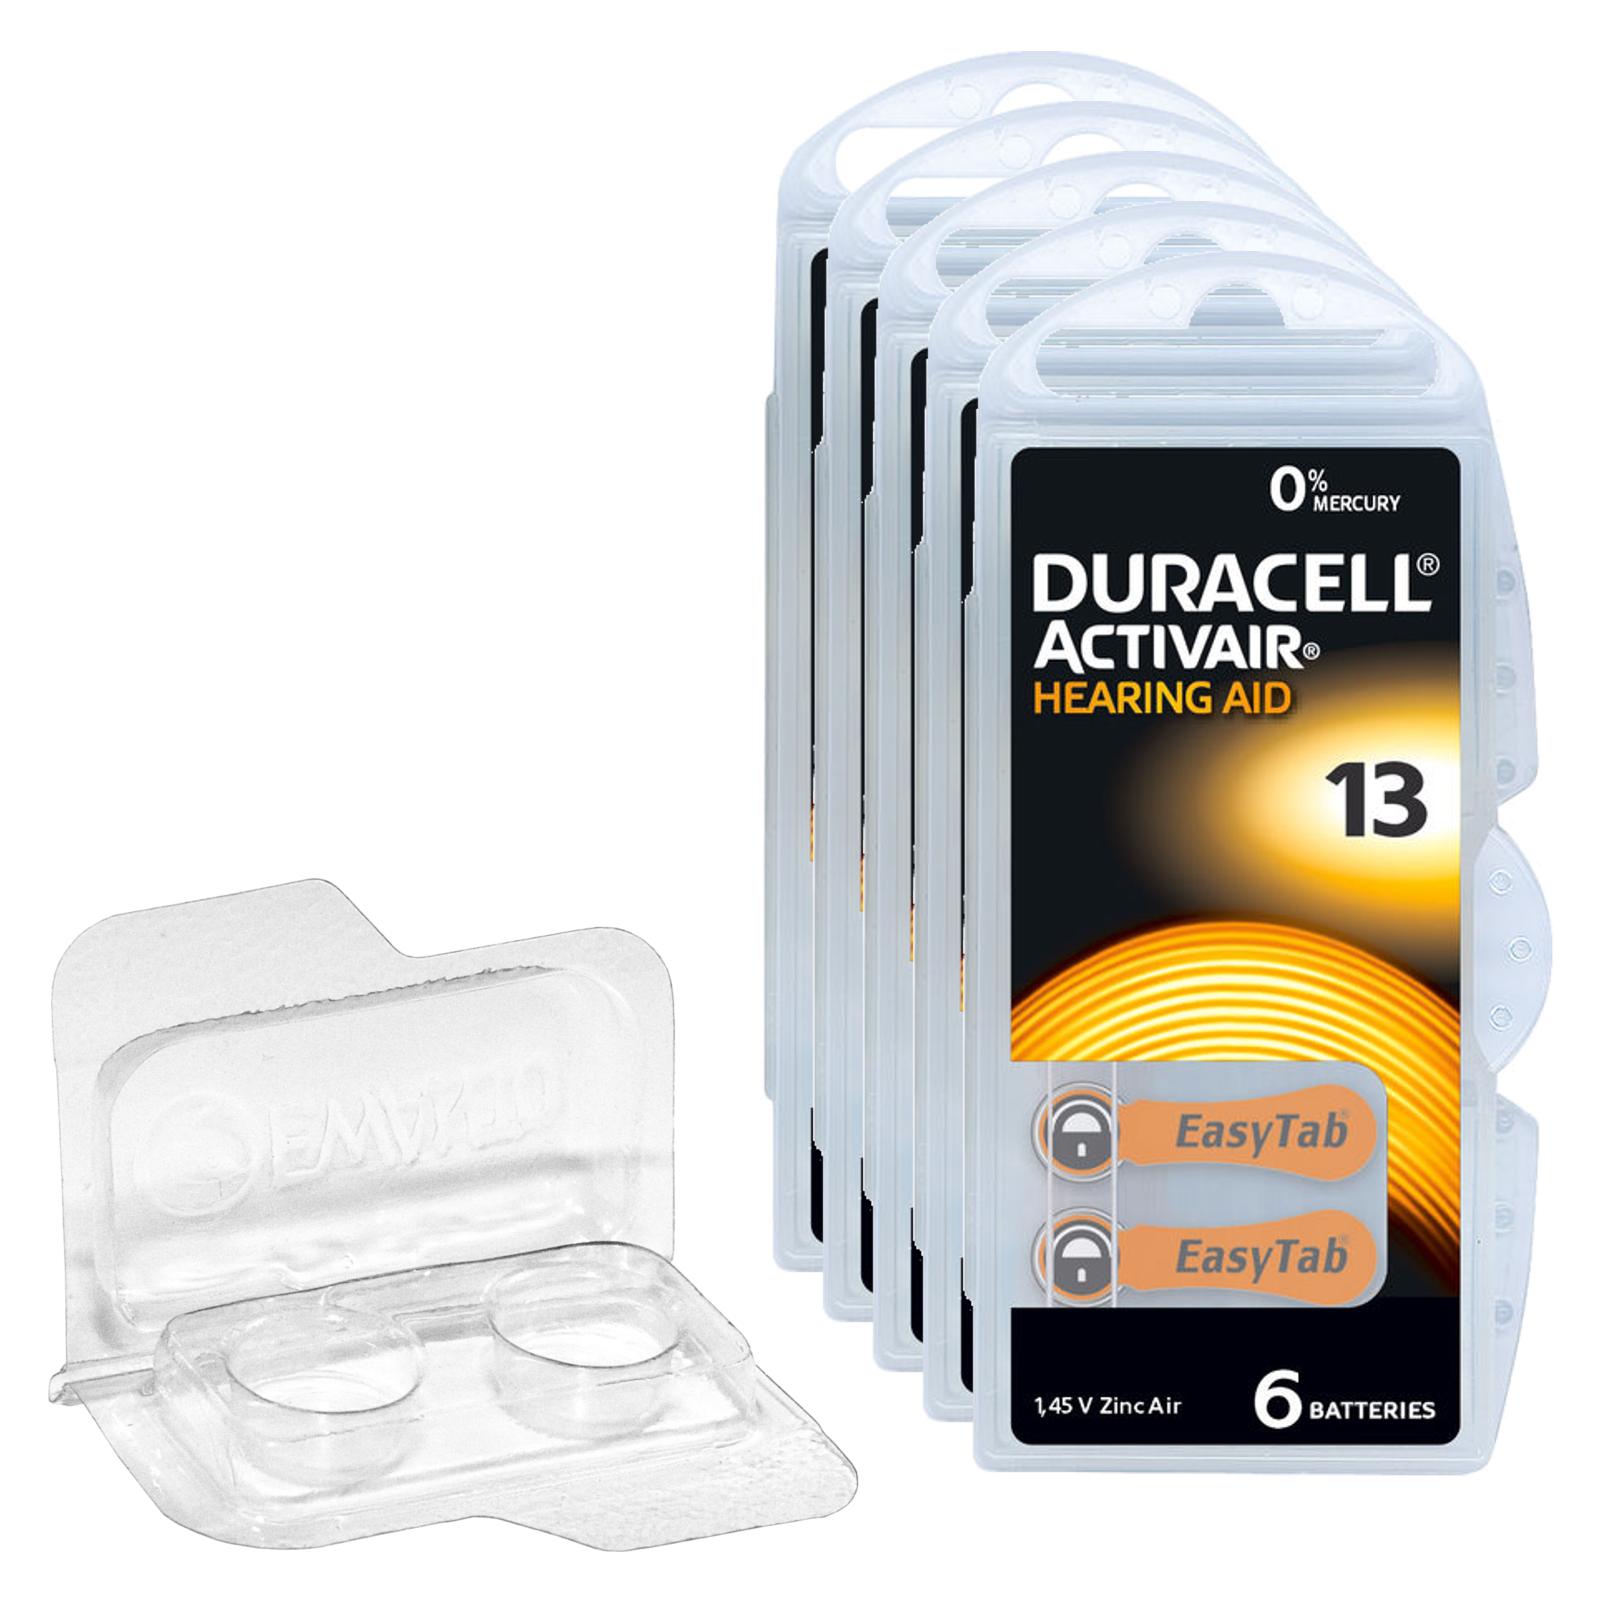 30 Duracell Activair Hearing Aid Batteries PR48 Orange 13 + Box for 2 cells